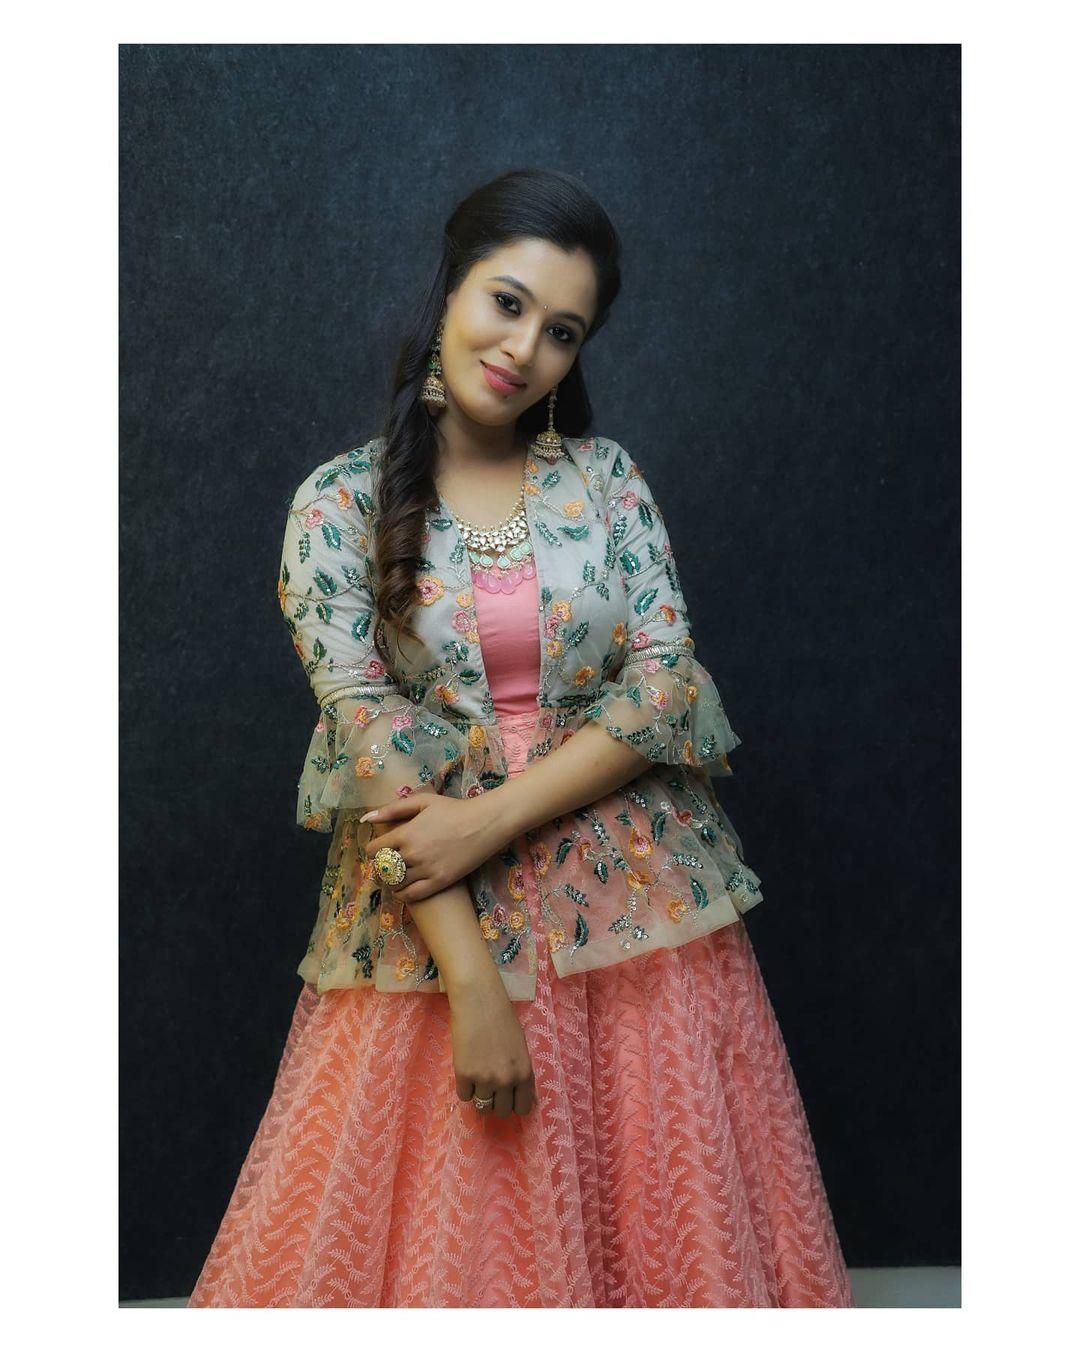 Neha Gowda Photos HD (2)